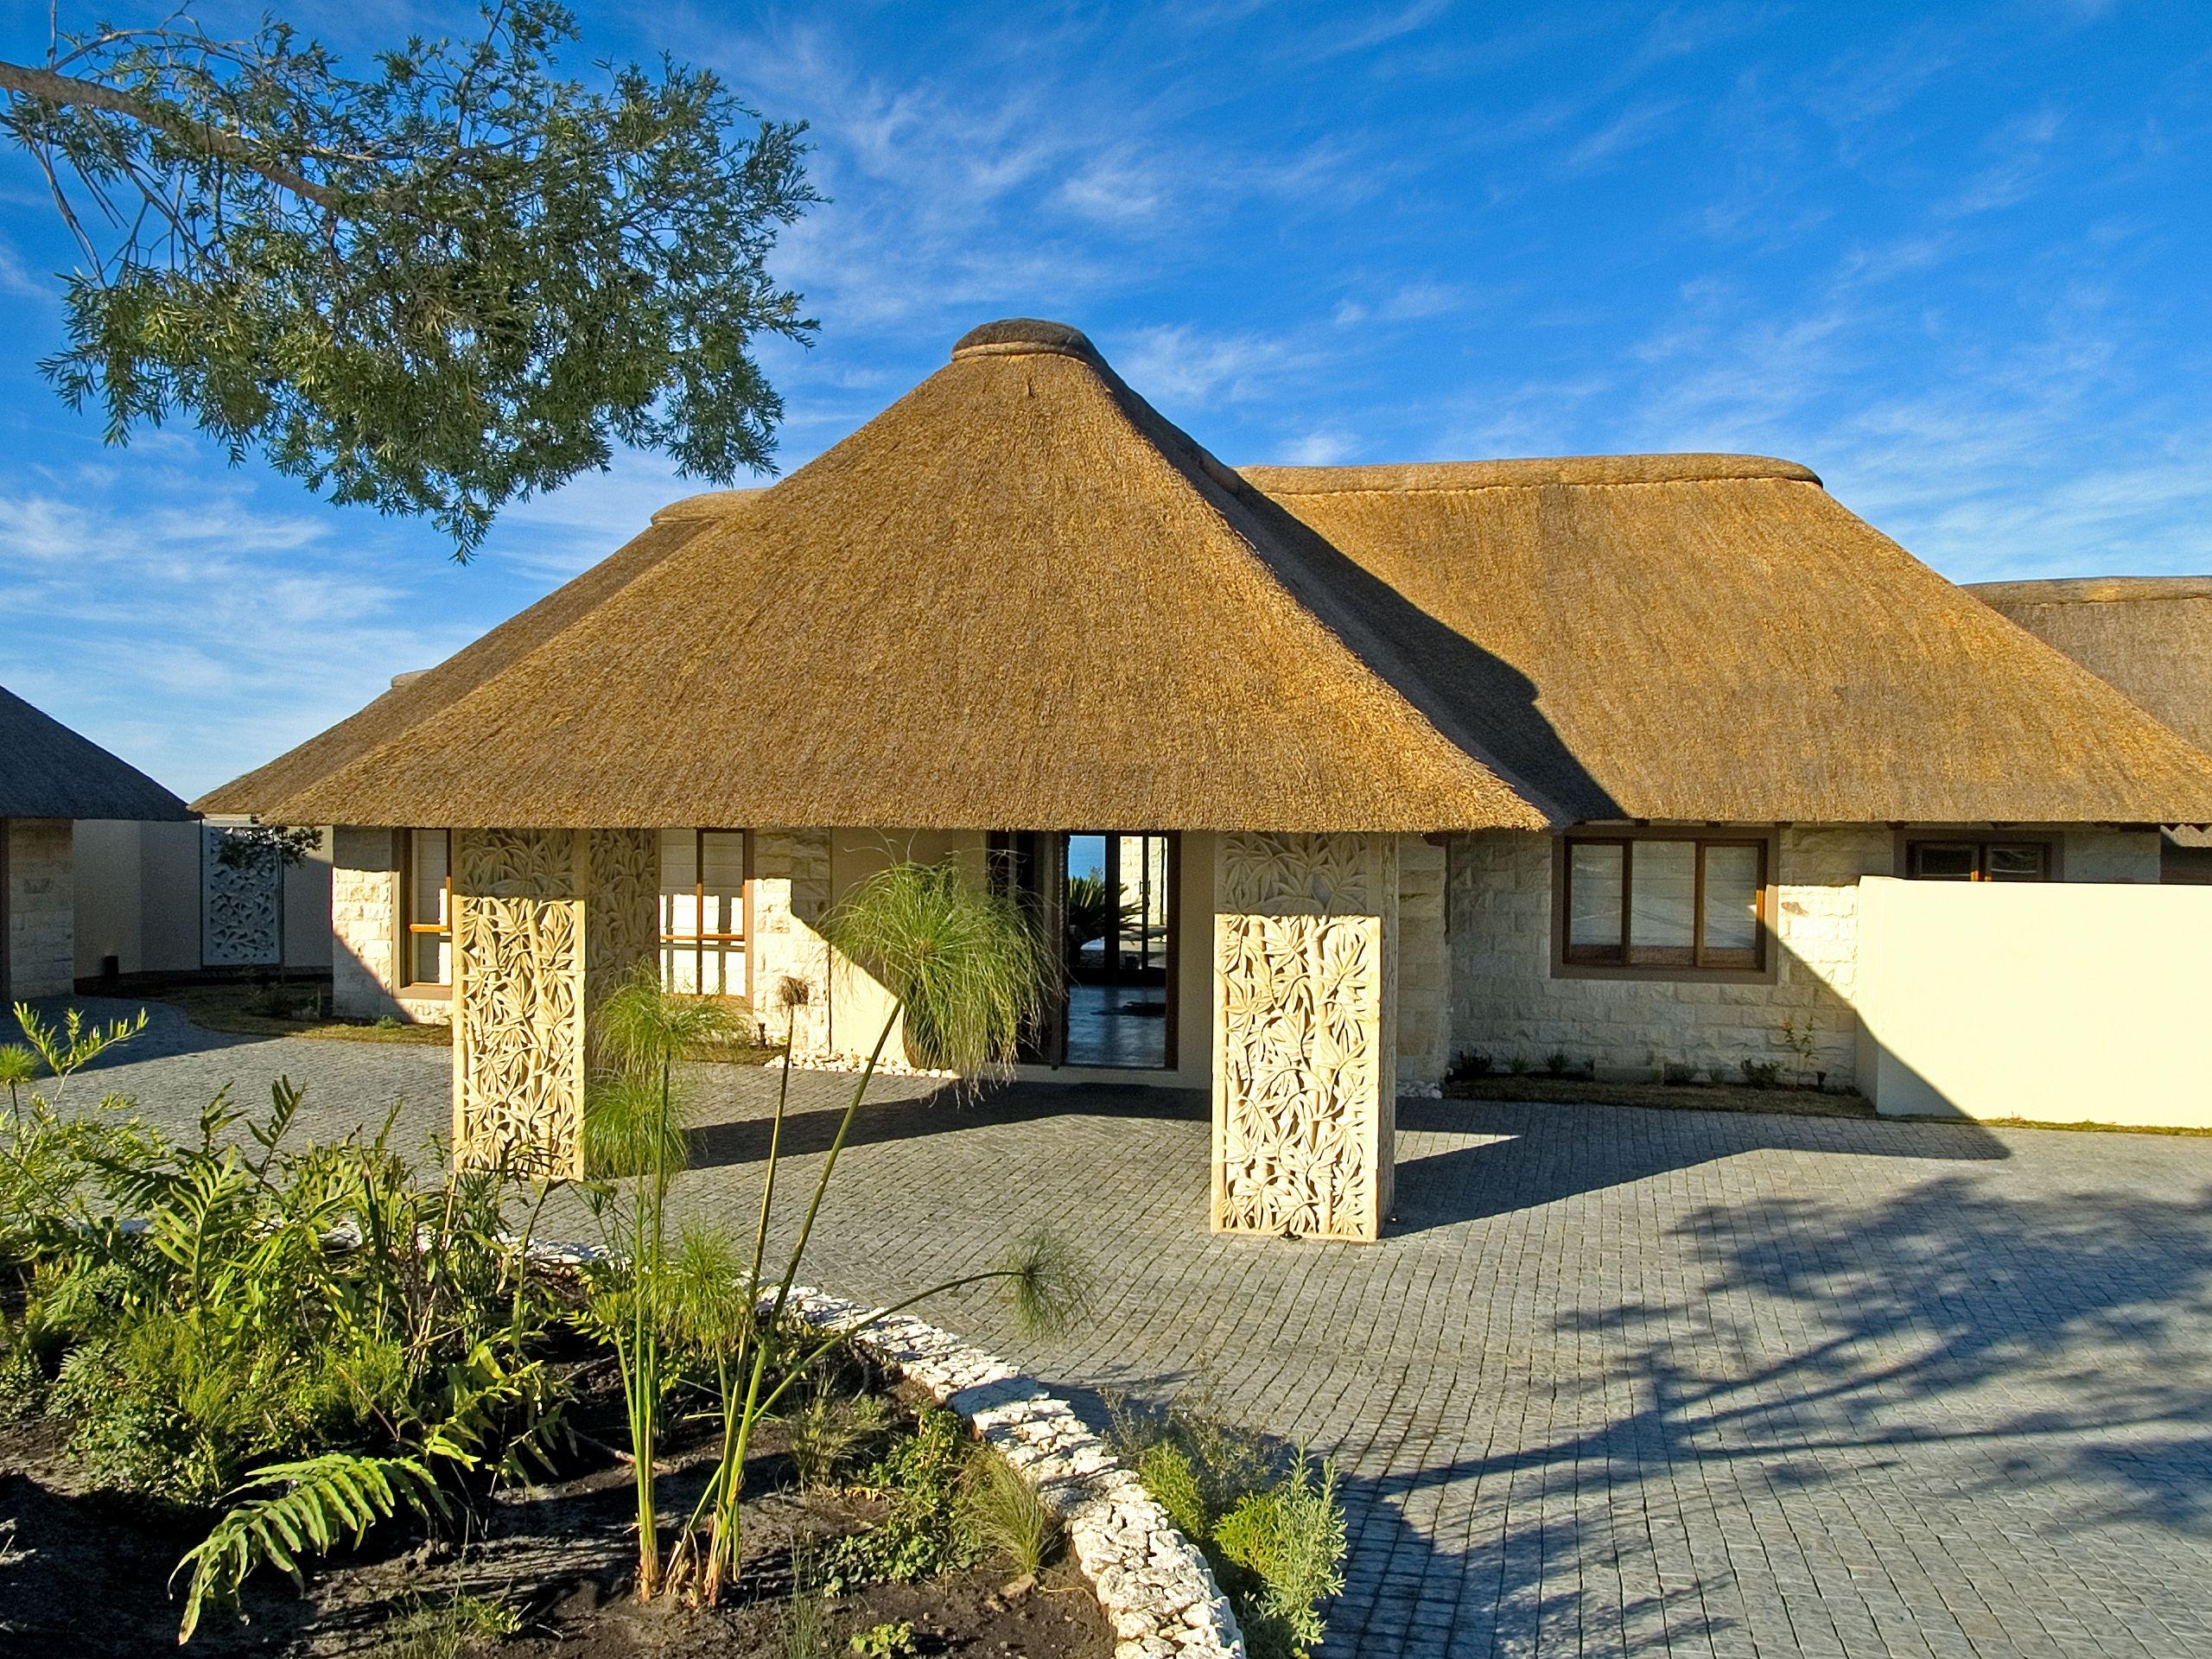 Thatch Homes Thatch Riet Home Architecture Thatched House Chalet Design Farmhouse Design